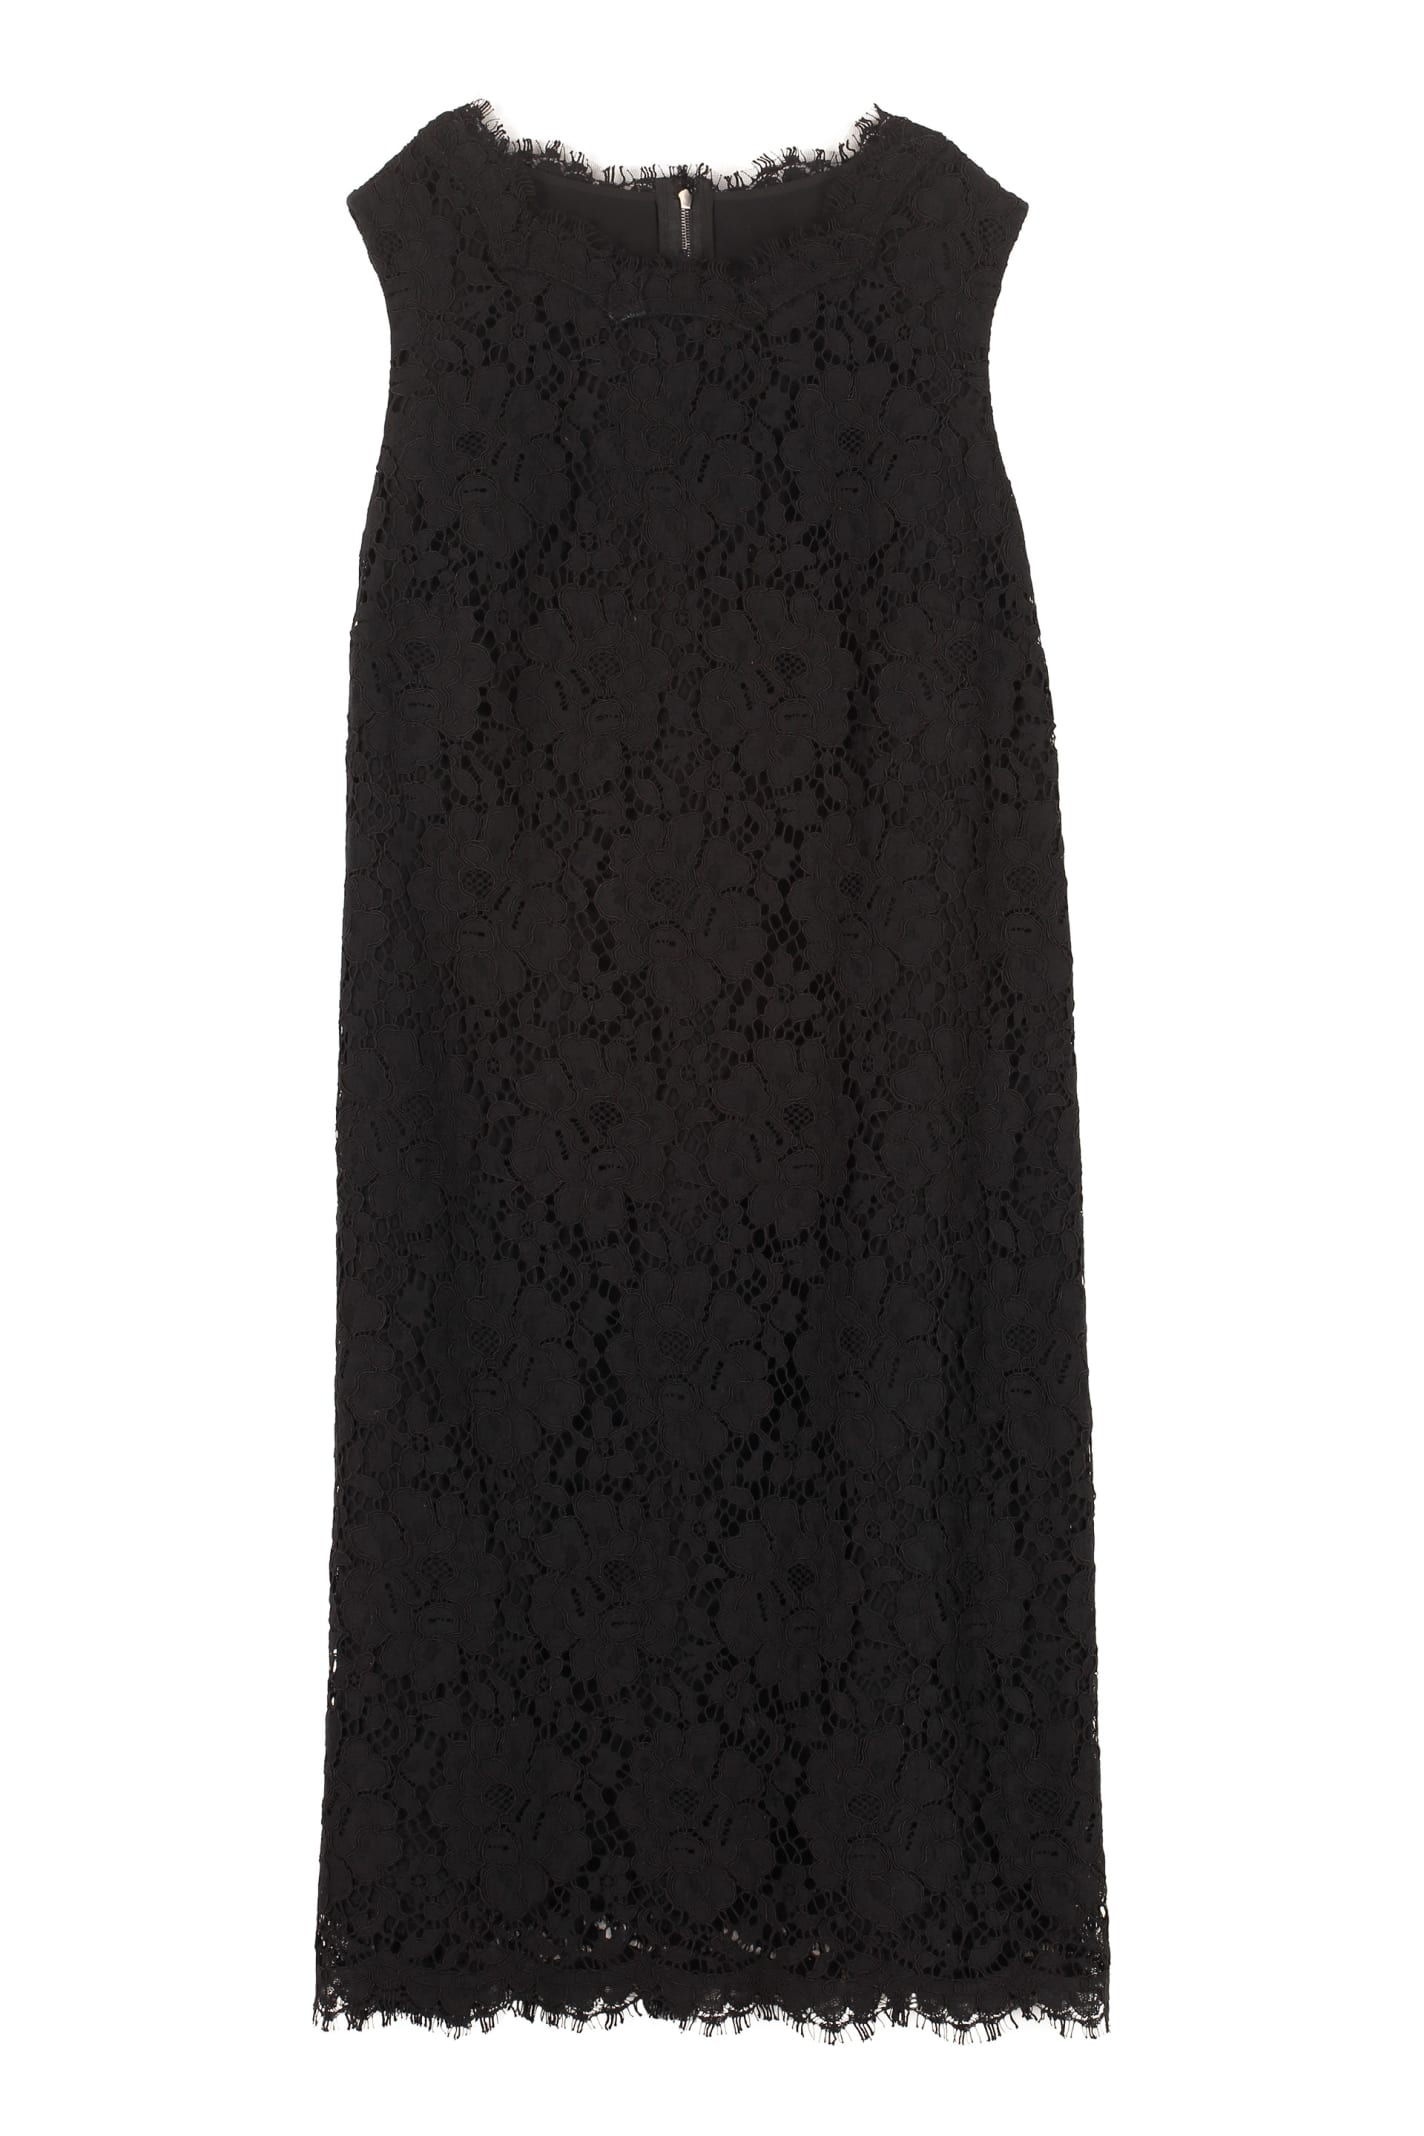 Dolce & Gabbana Floral Pattern Lace Dress